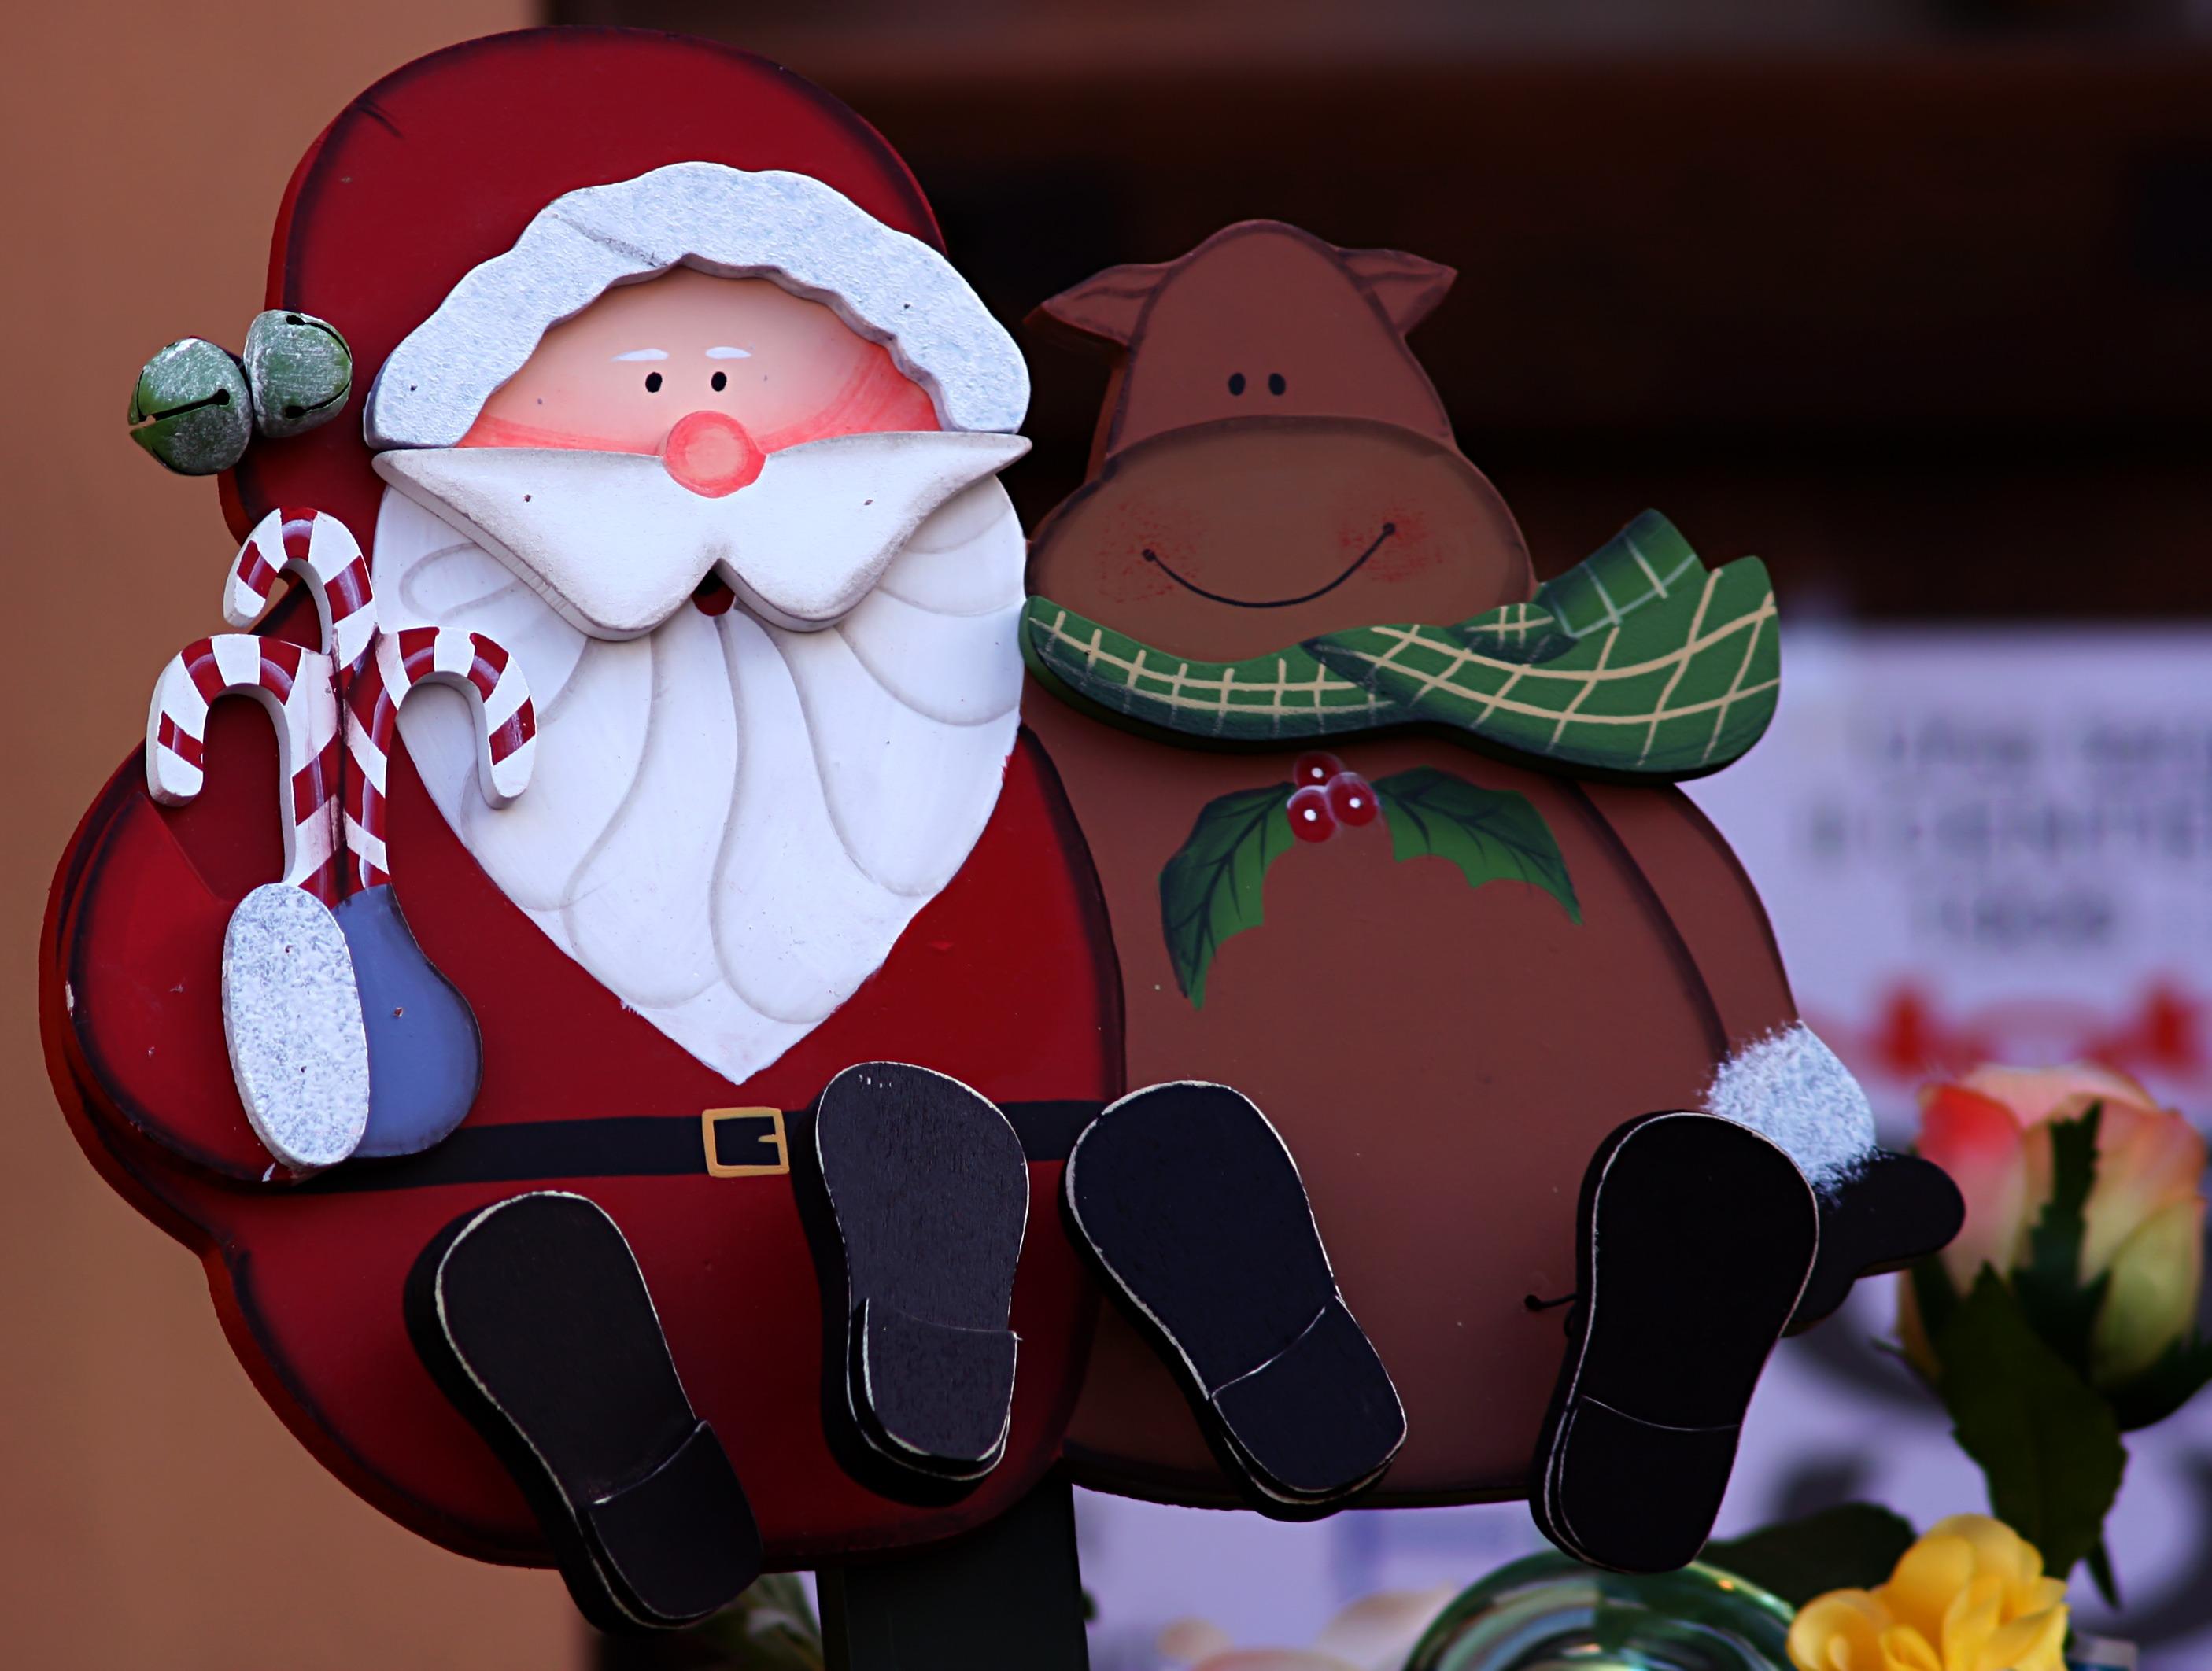 Karácsonyi dalok angolul 2.